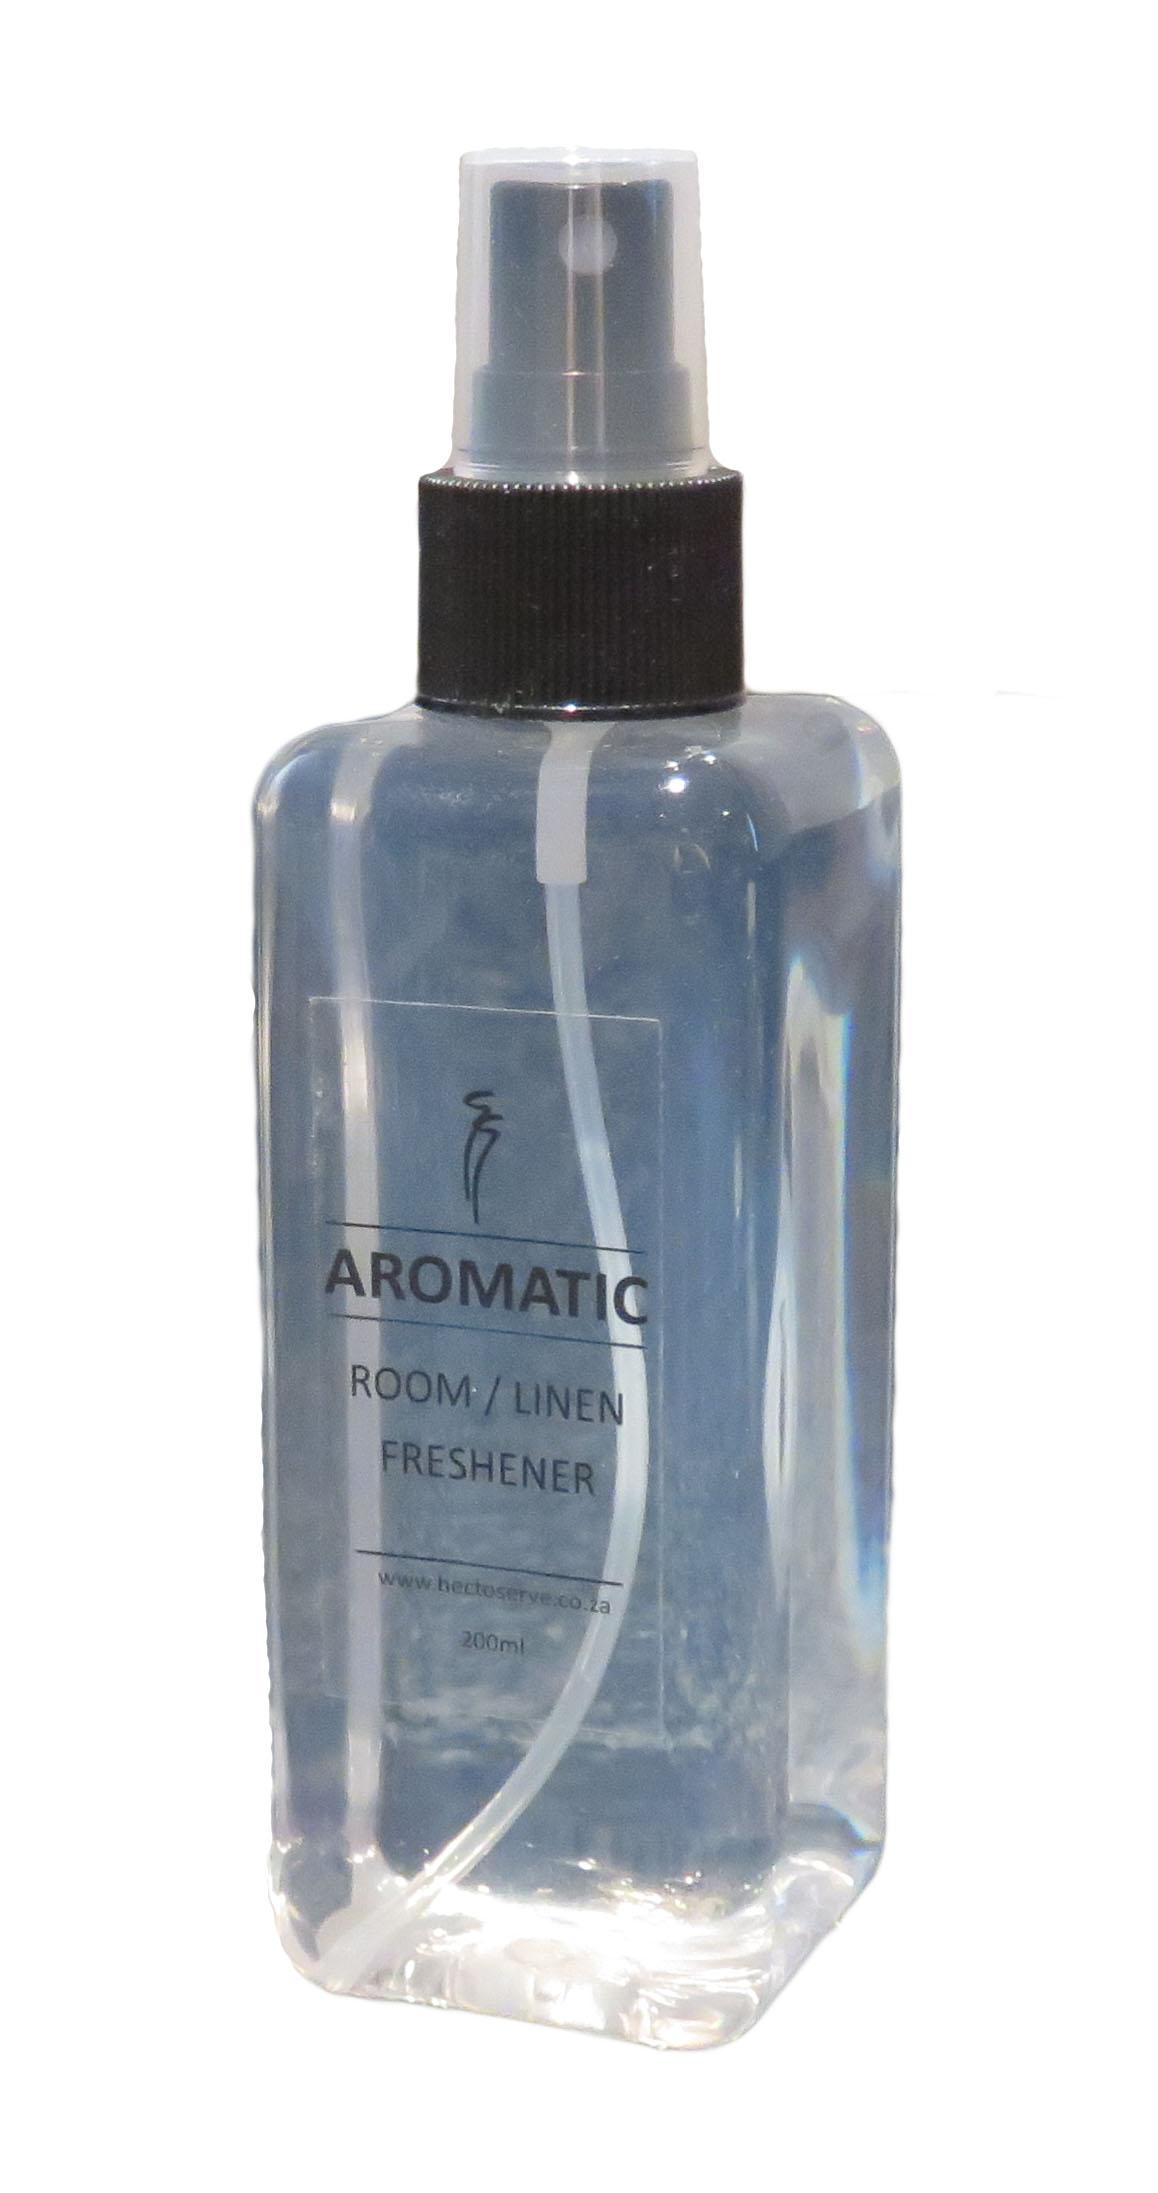 Aromatic Linen and Room Freshener